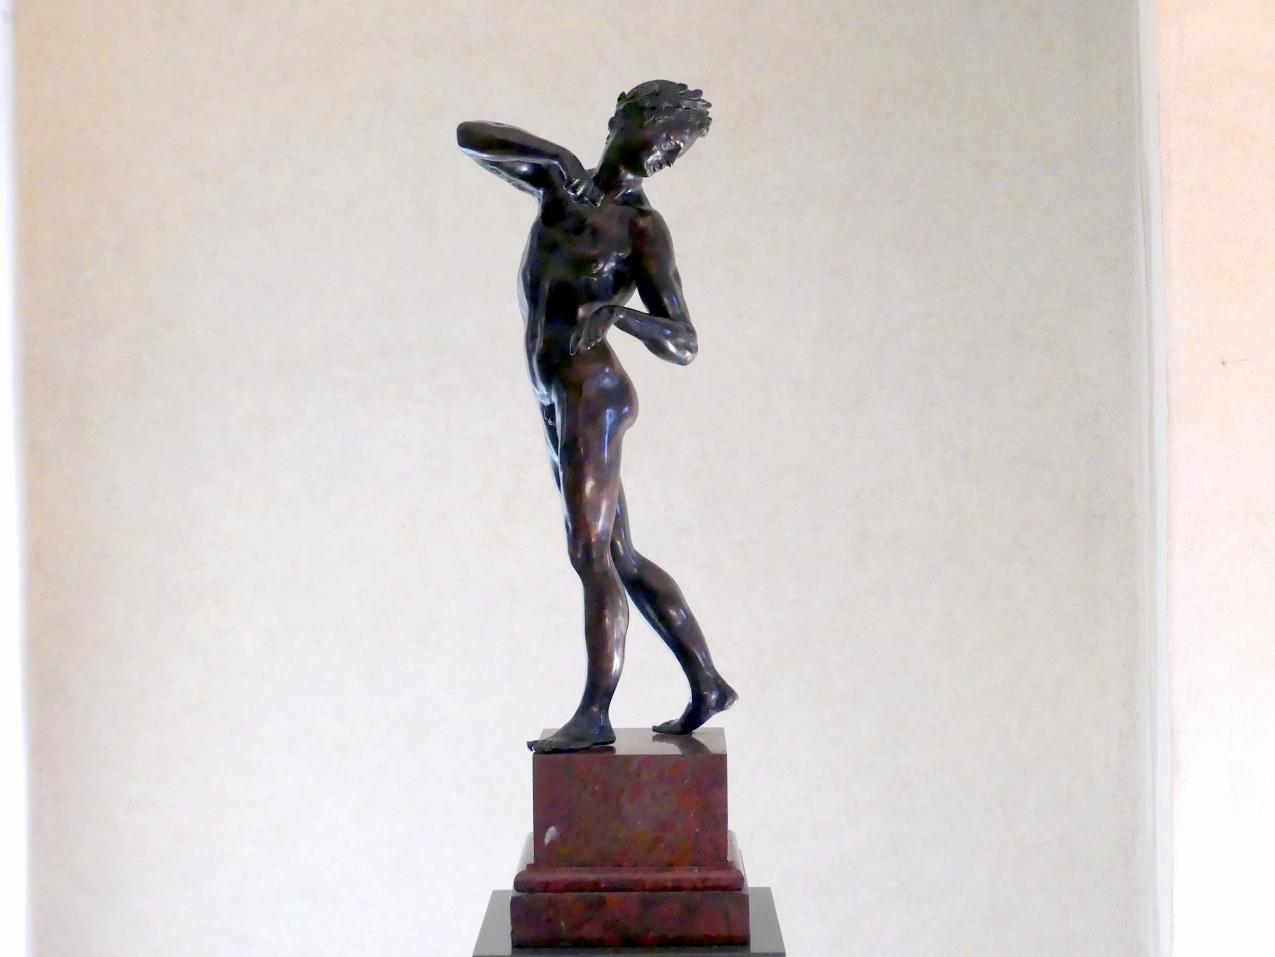 Adriaen de Vries: Tanzender Faun, um 1601